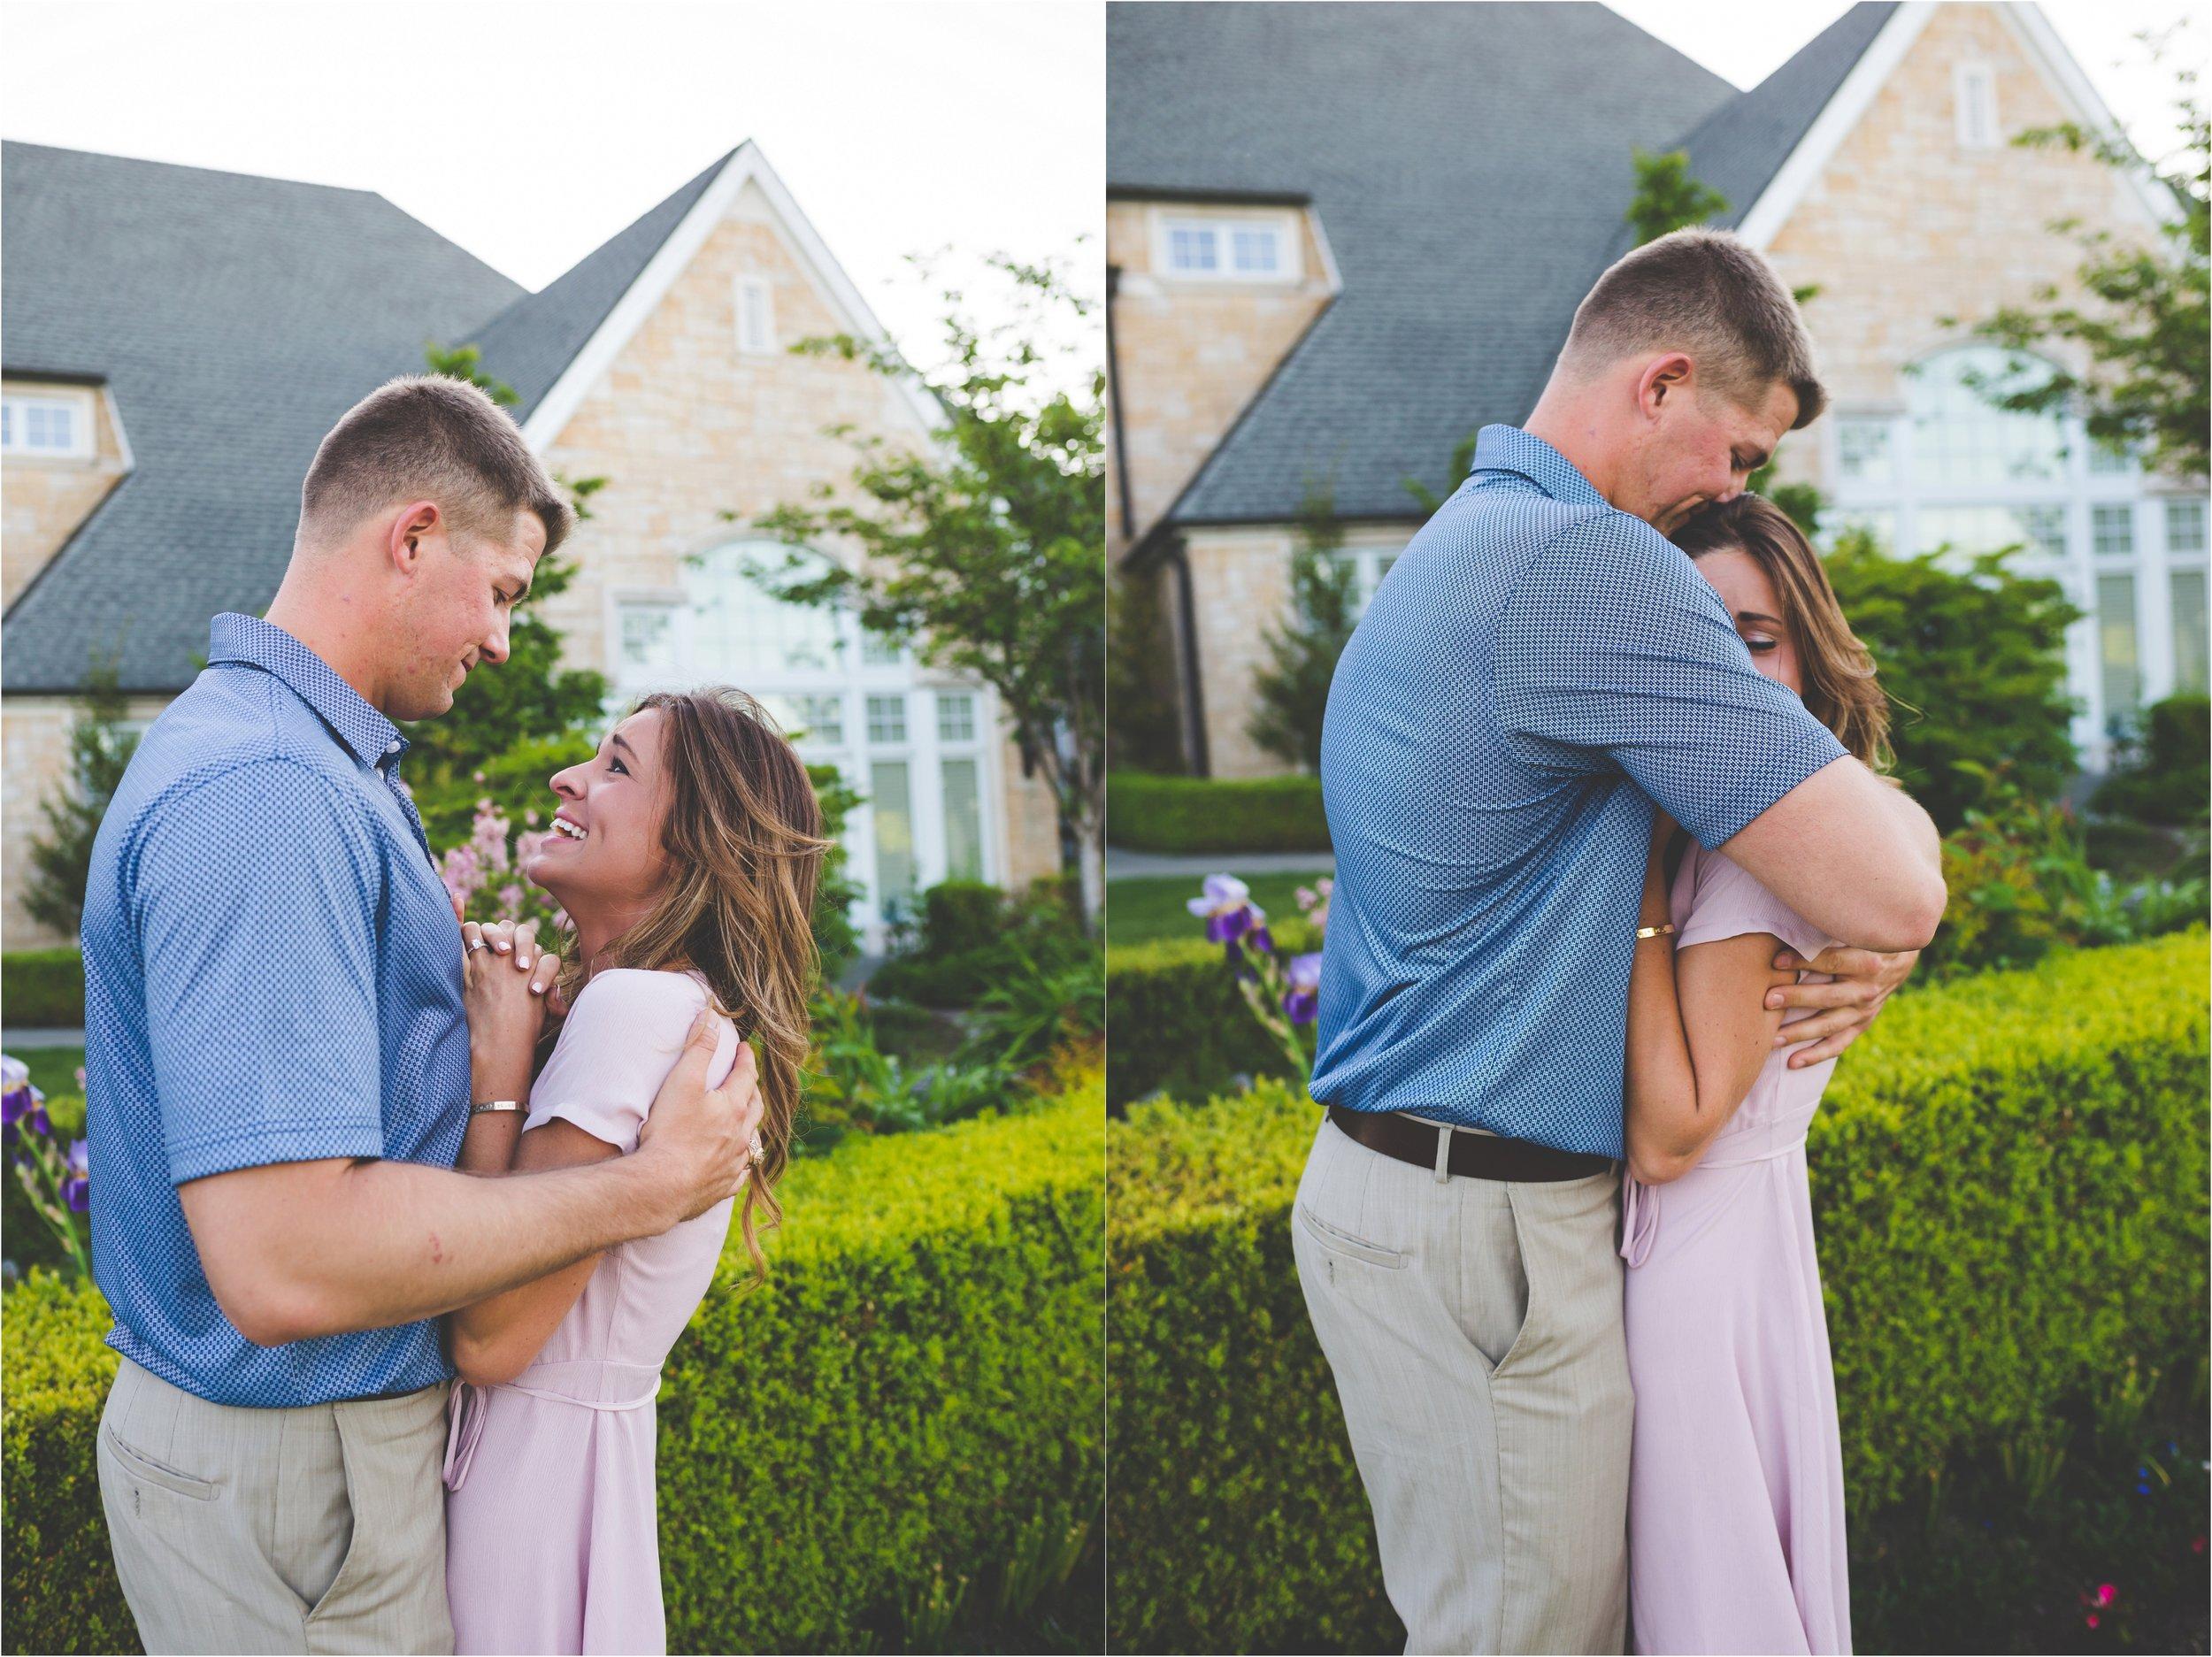 newcastle-golf-club-proposal-jannicka-mayte-seattle-washington-engagement-wedding-photographer_0045.jpg